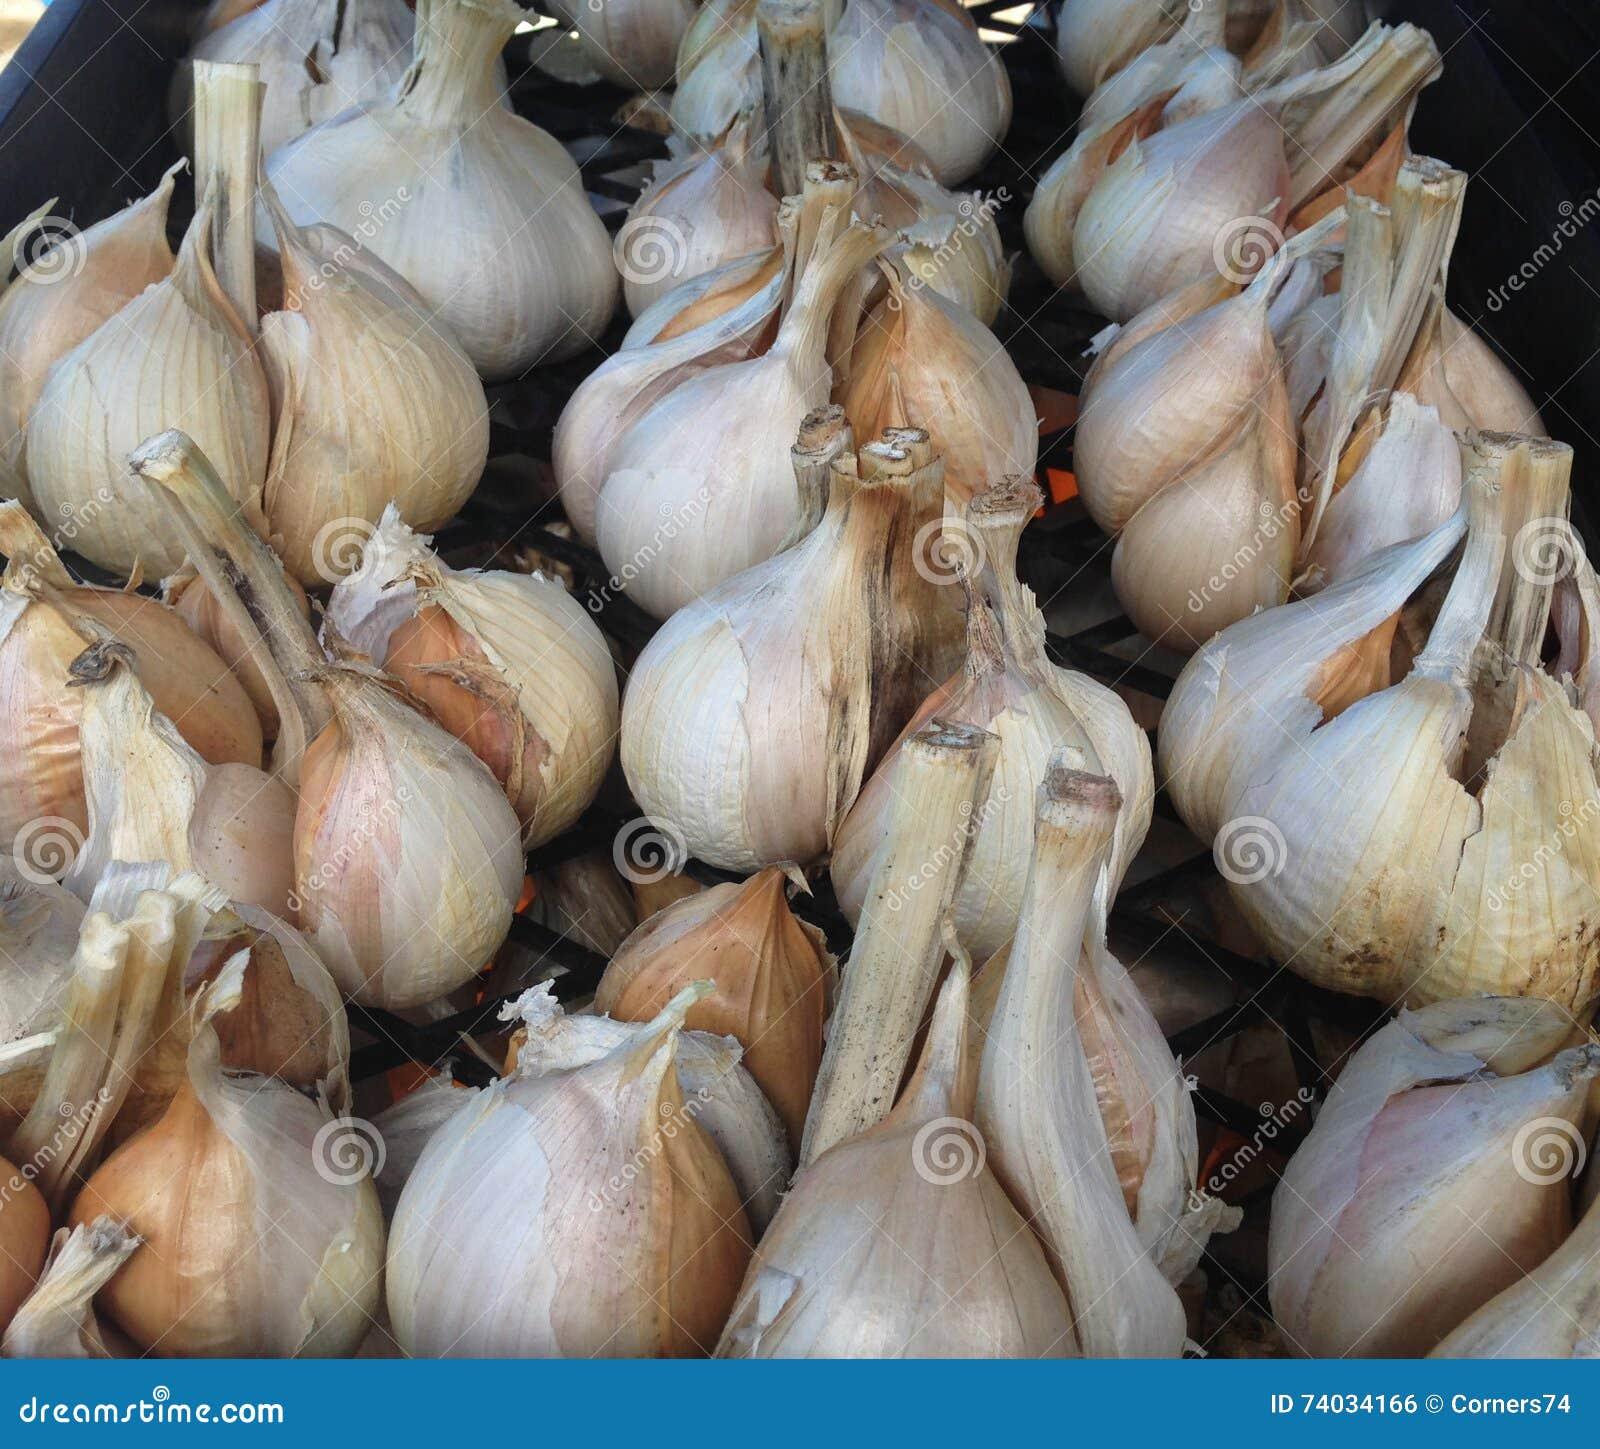 Elephant garlic cloves at a farmers market